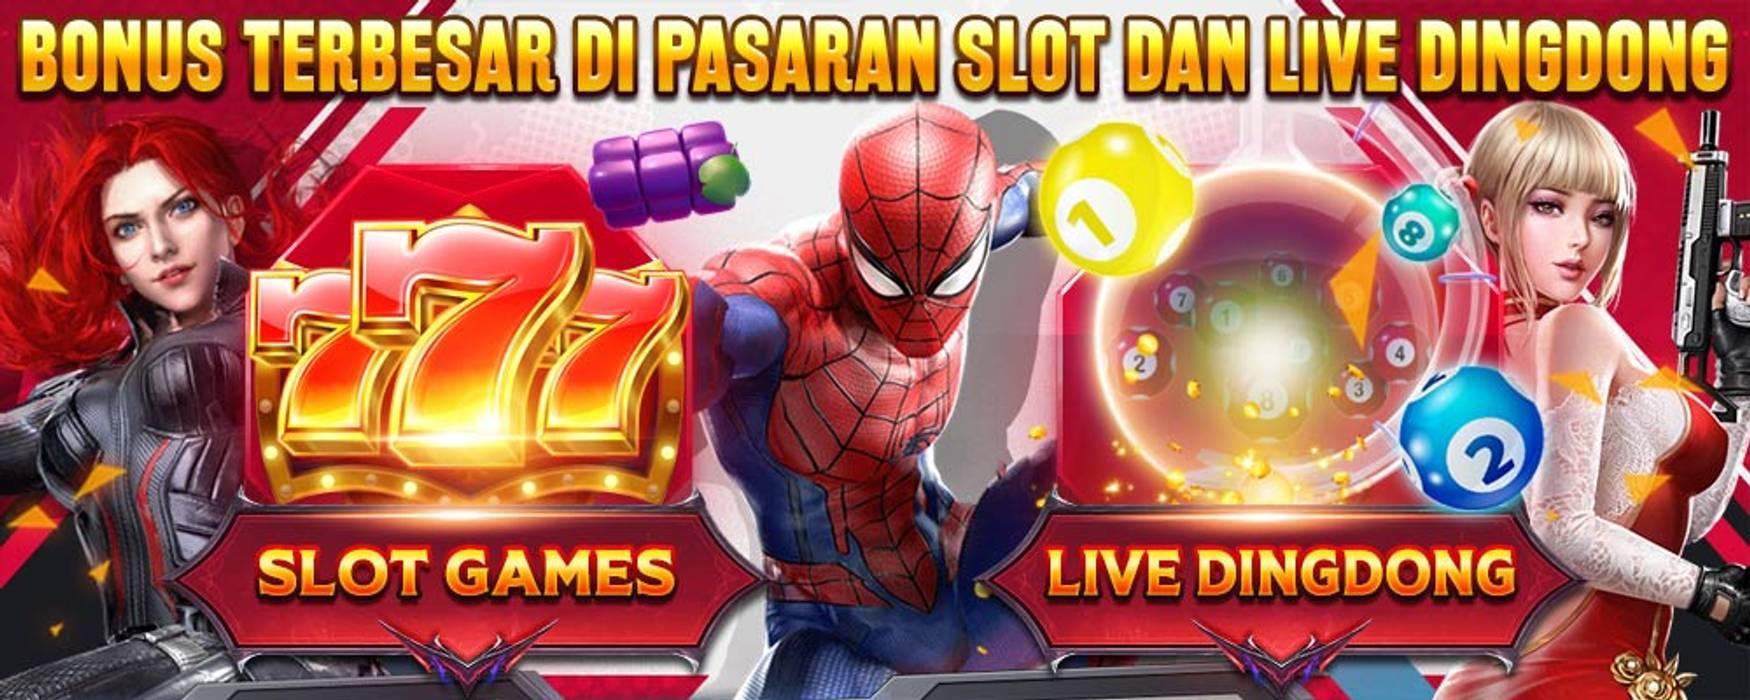 Sbobet Live Casino Slot Dingdong Jokerbet303 Homify